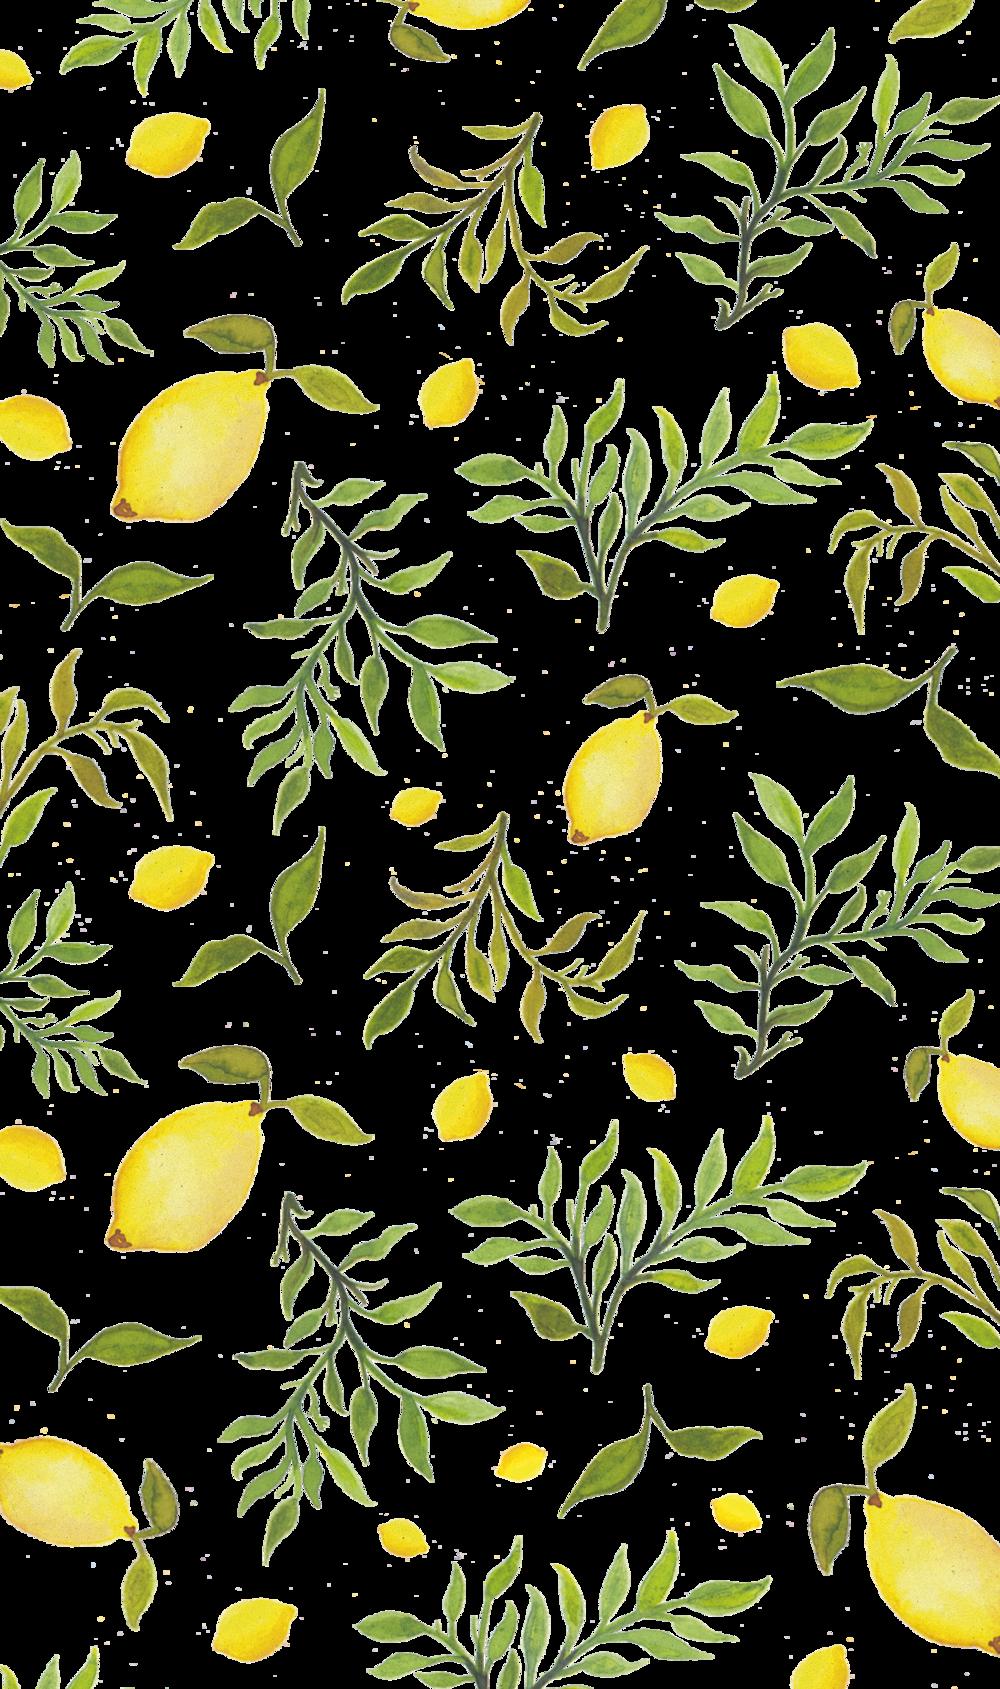 lemon-pattern-transparent.png